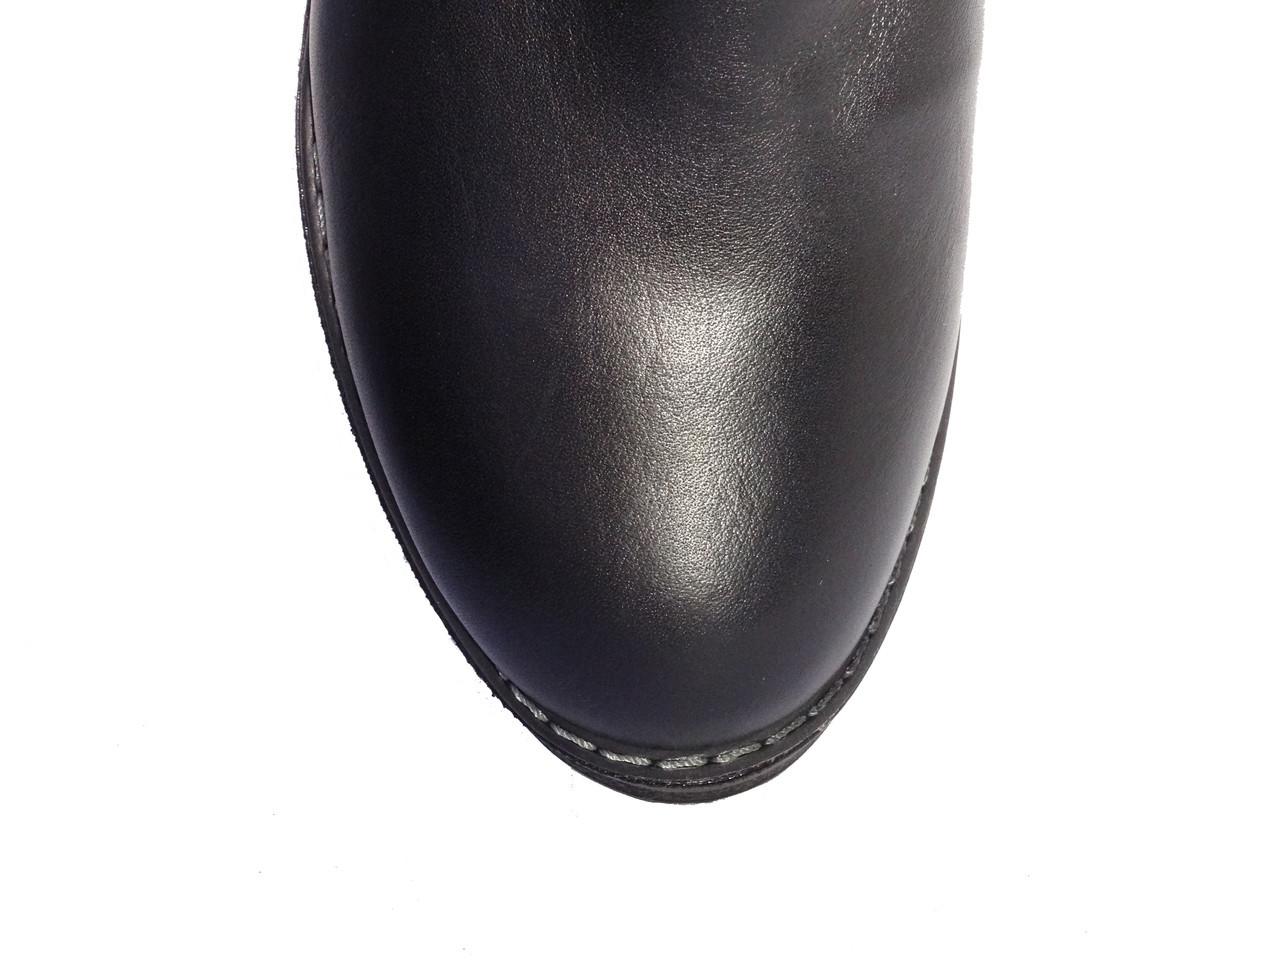 4c34f8cdf488 Женские кожаные зимние сапоги низкий ход Tucino №101-1141